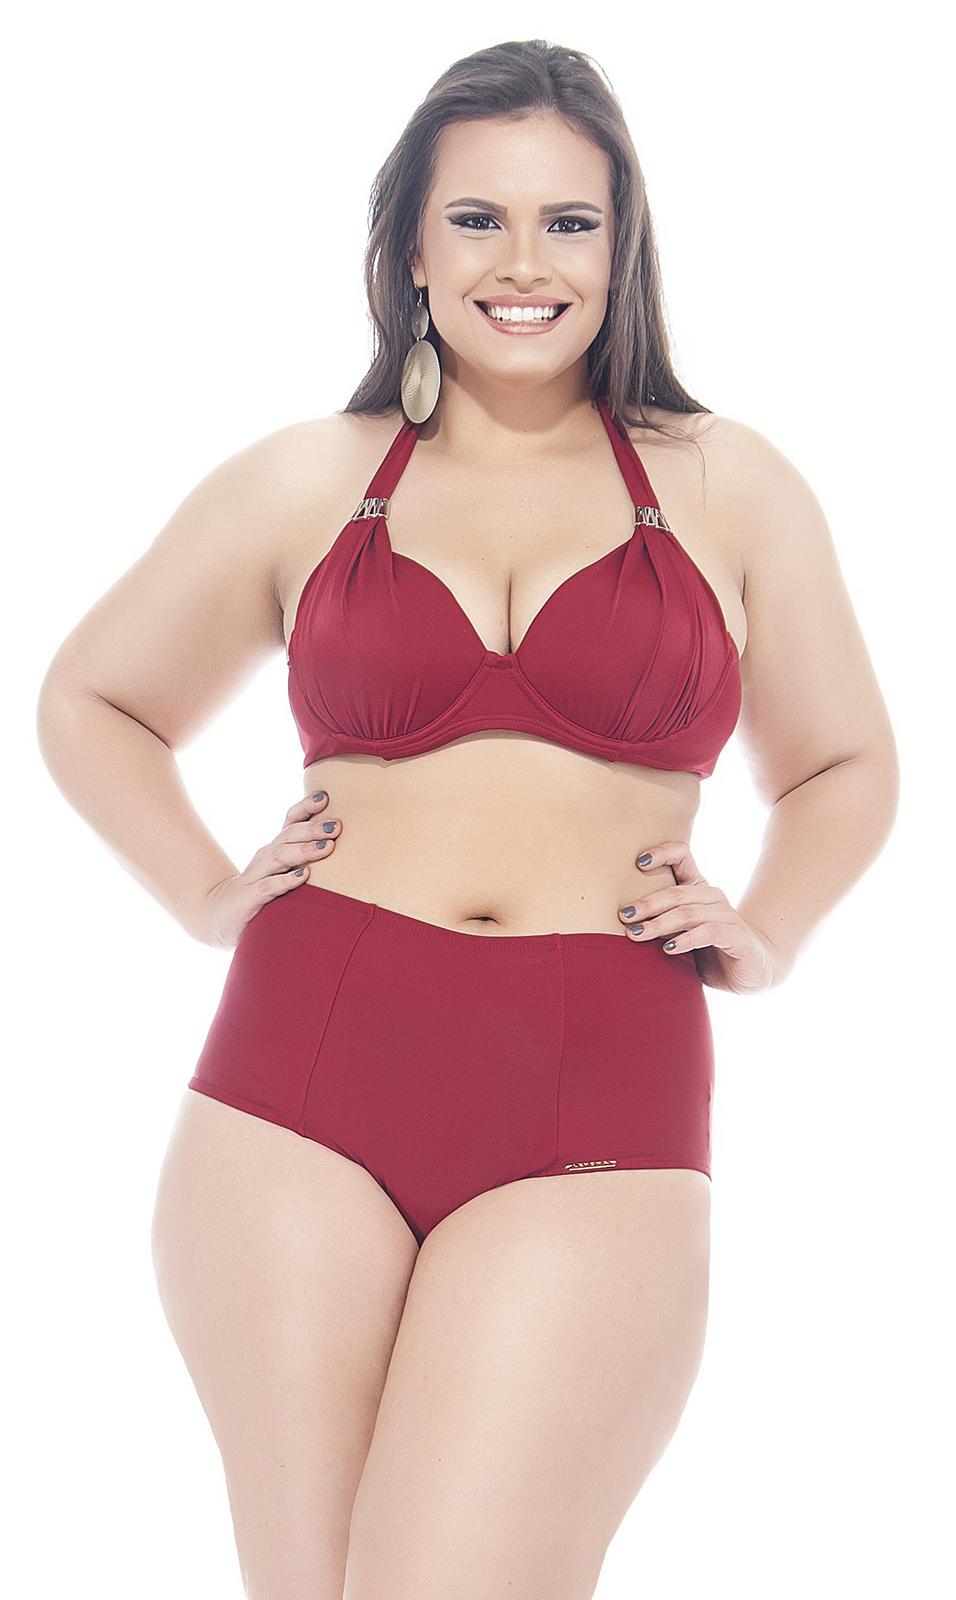 6719027d9a Bikini Taille Haute Rouge Foncé Grande Taille - Pimentinha - Lehona